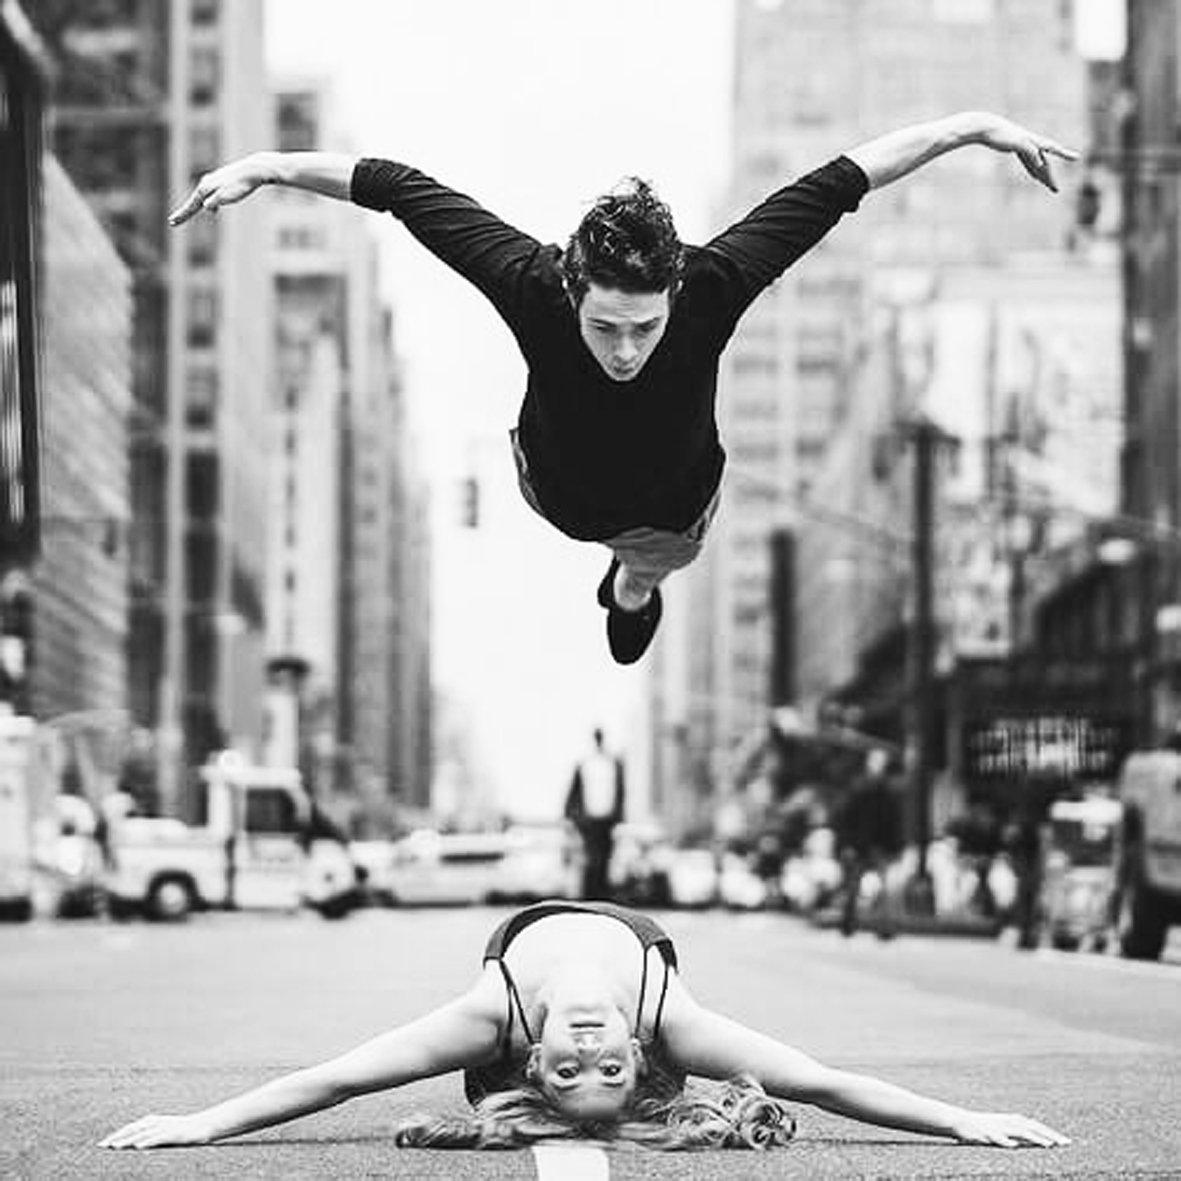 RT @PierreBotte1: #Dancing in the #Street https://t.co/zdBgYUlgiD